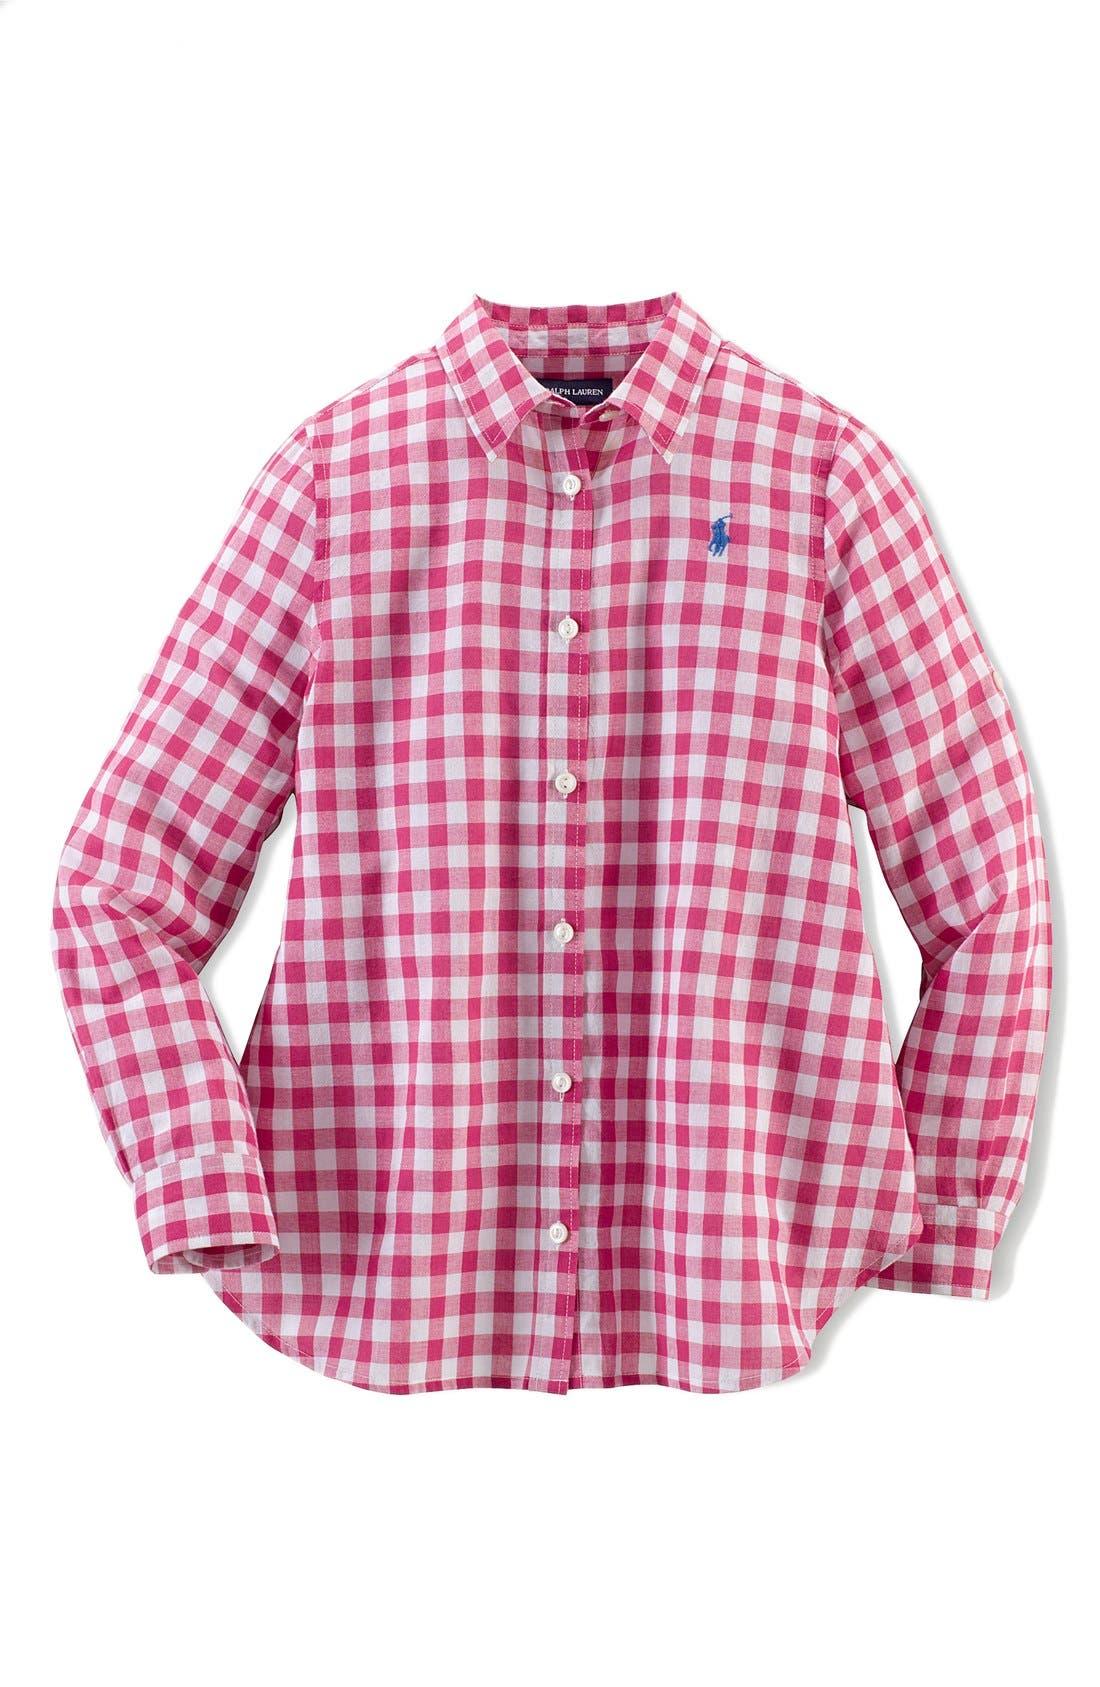 Alternate Image 1 Selected - Ralph Lauren Gingham Cotton Gauze Shirt (Big Girls)